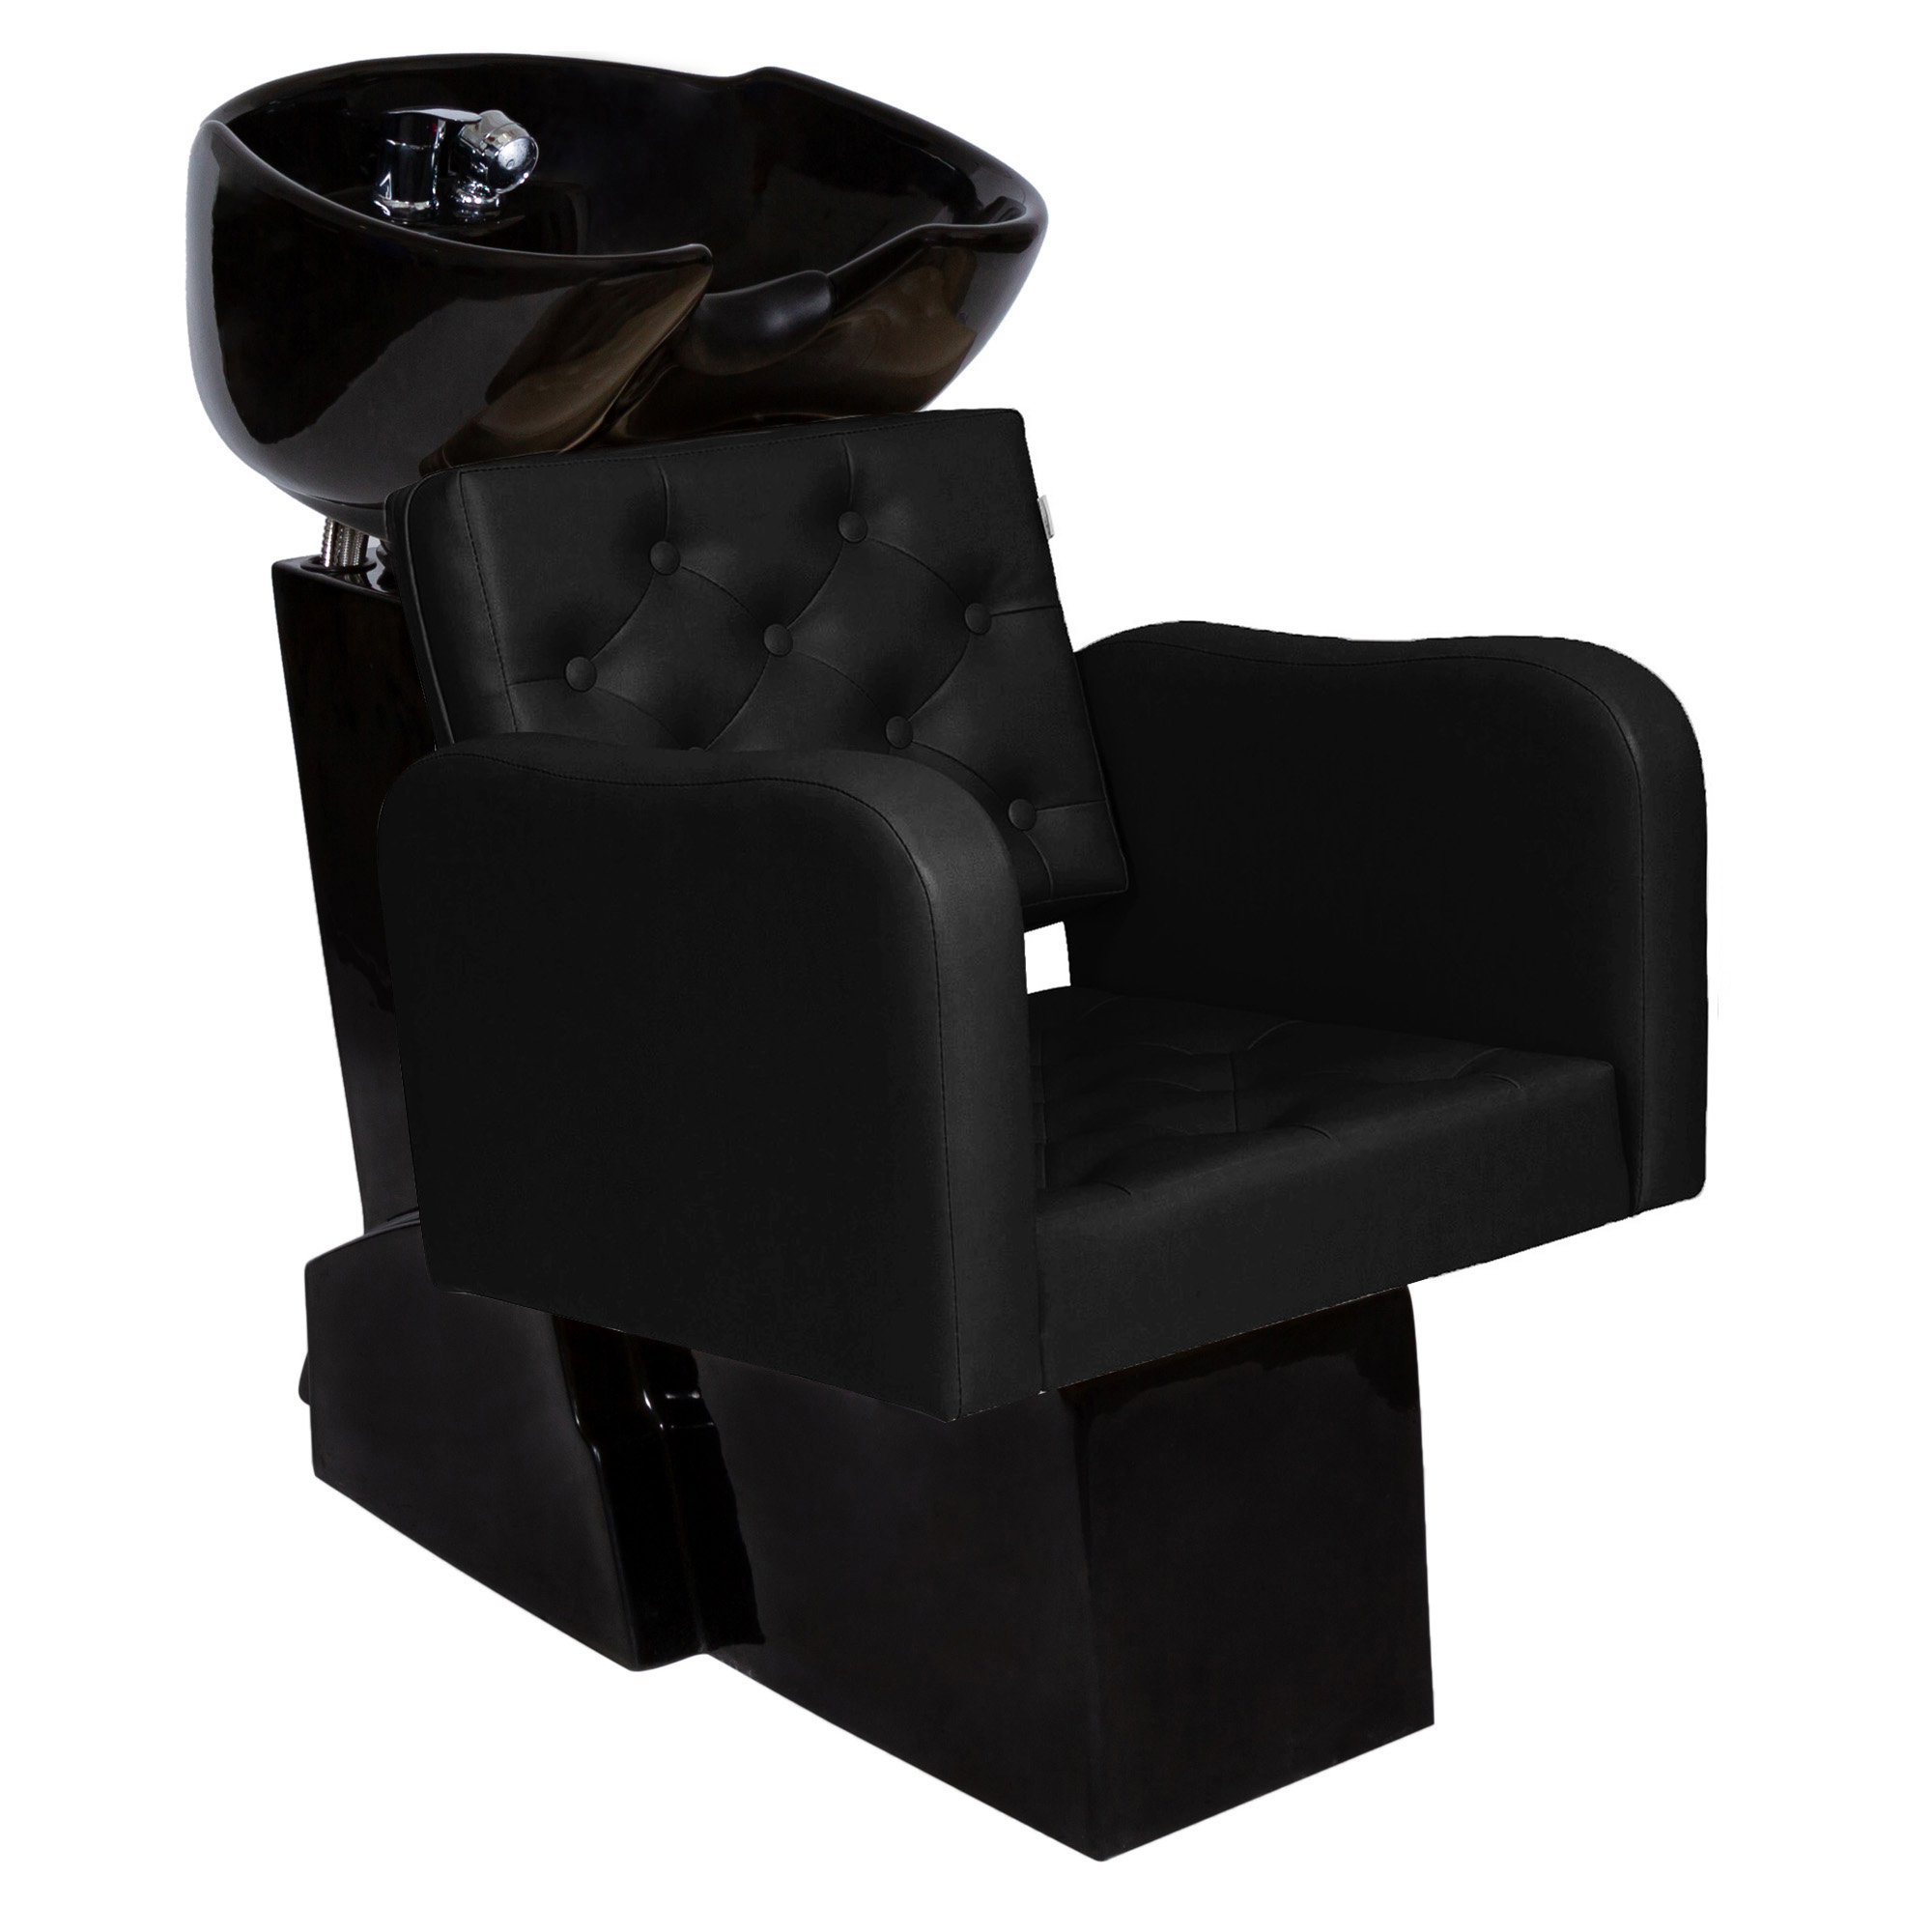 Kit Lavatório Base Preta + Cadeira Poltrona Reclinável Tokyo